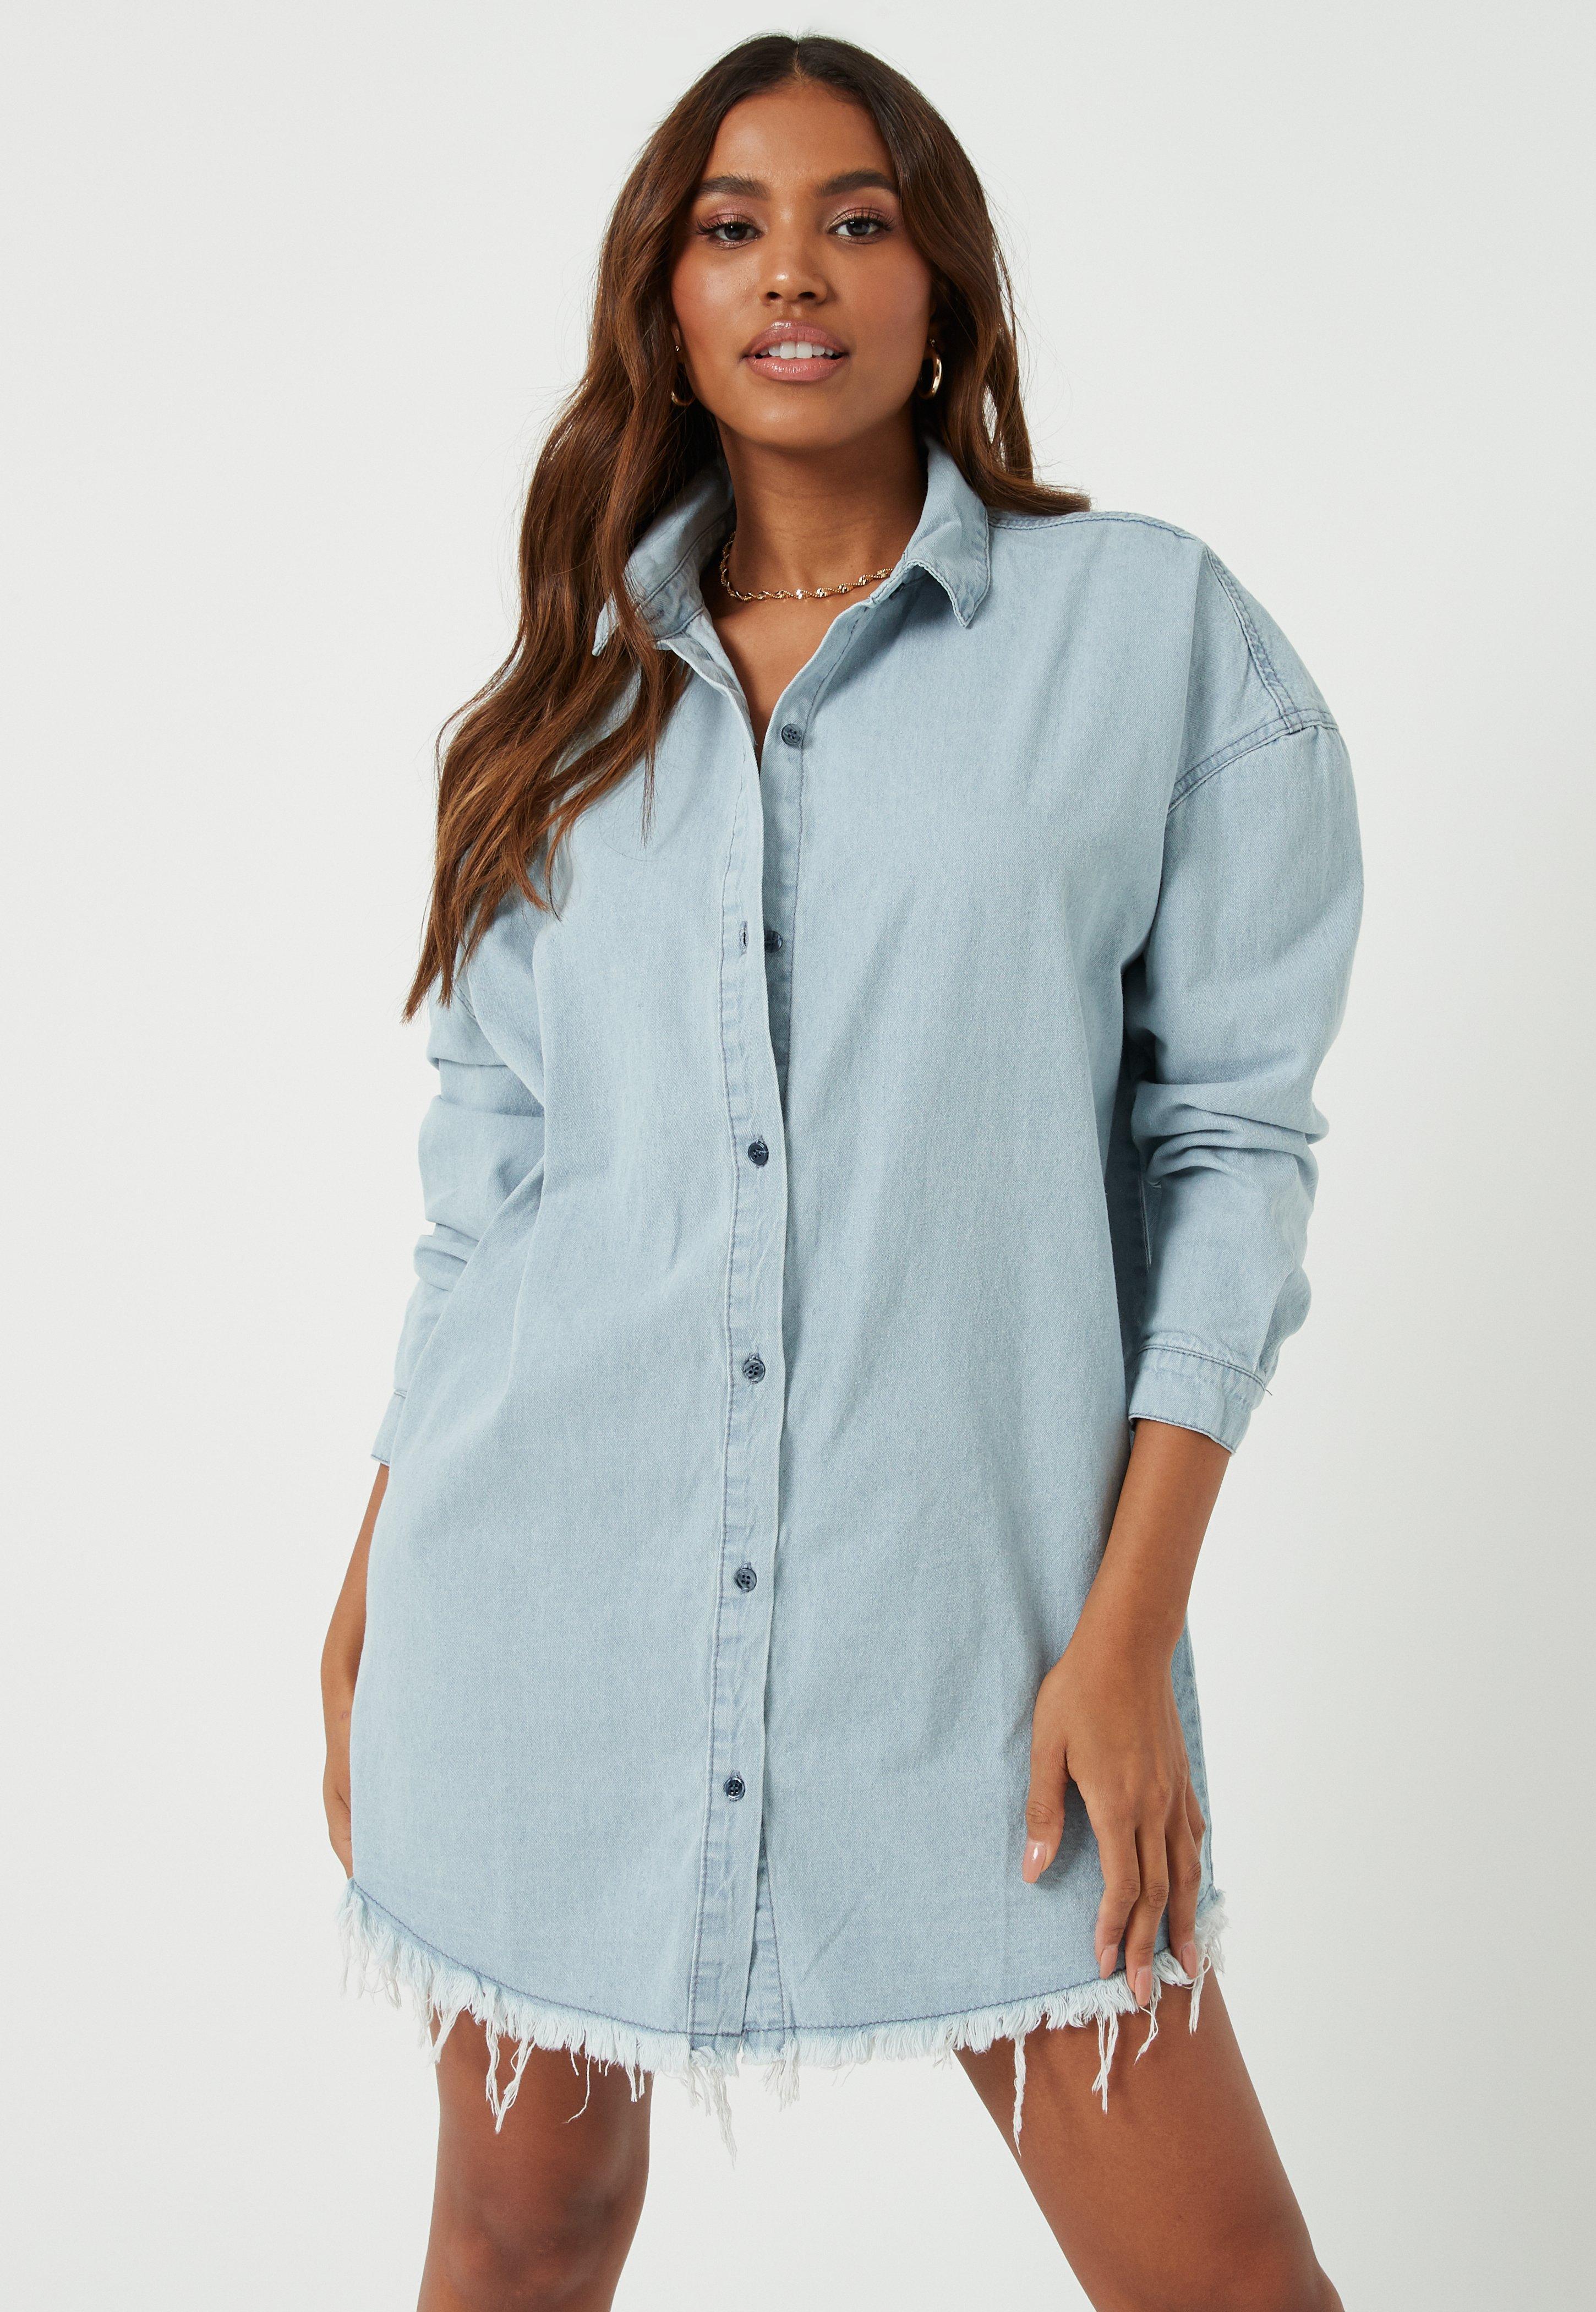 d0b471494a1f0 Kleider für Damen - Missguided DE